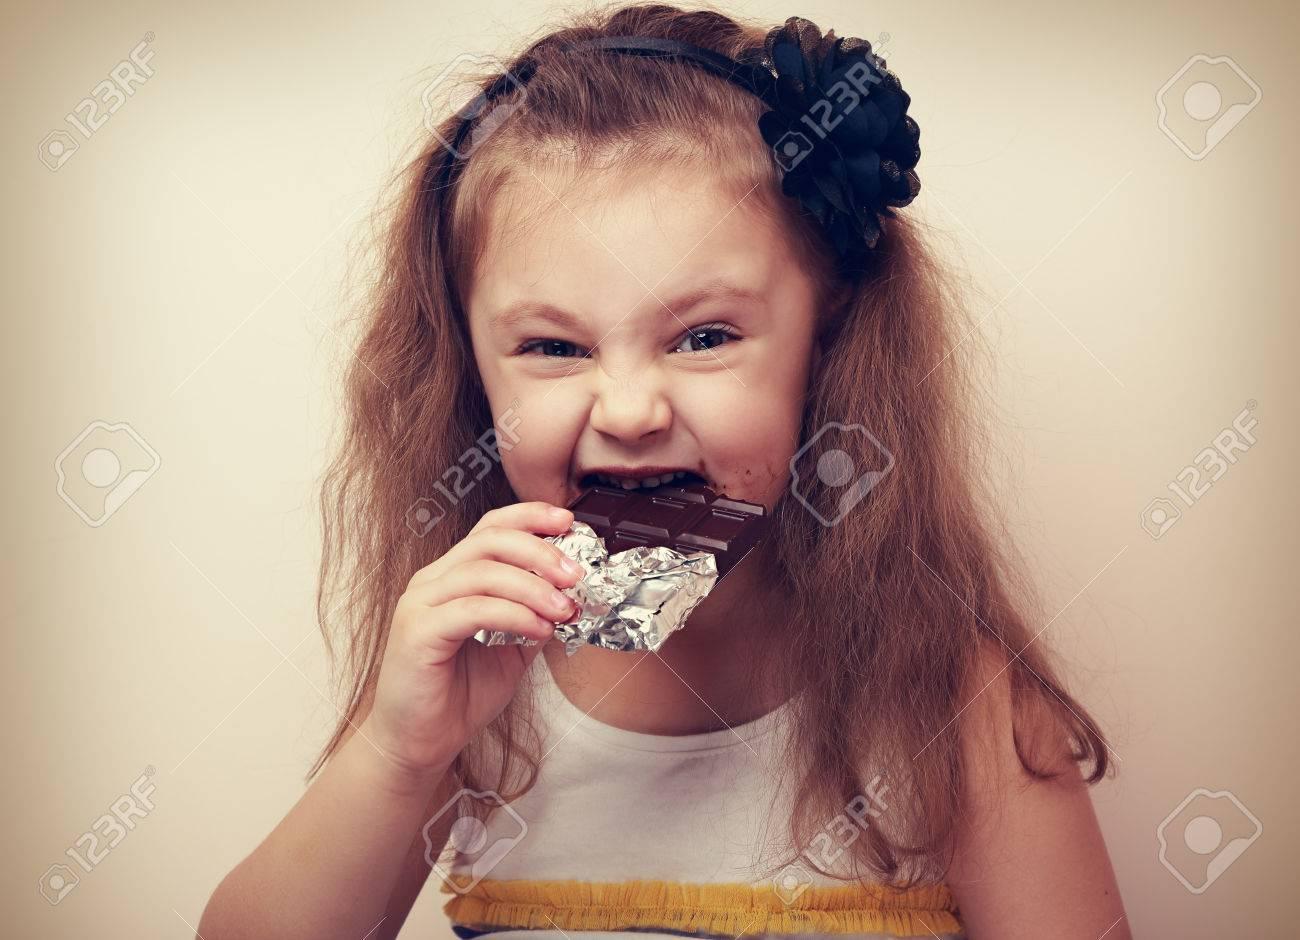 Happy fun smiling kid girl biting dark chocolate with craving eyes. Vintage closeup portrait - 39038546